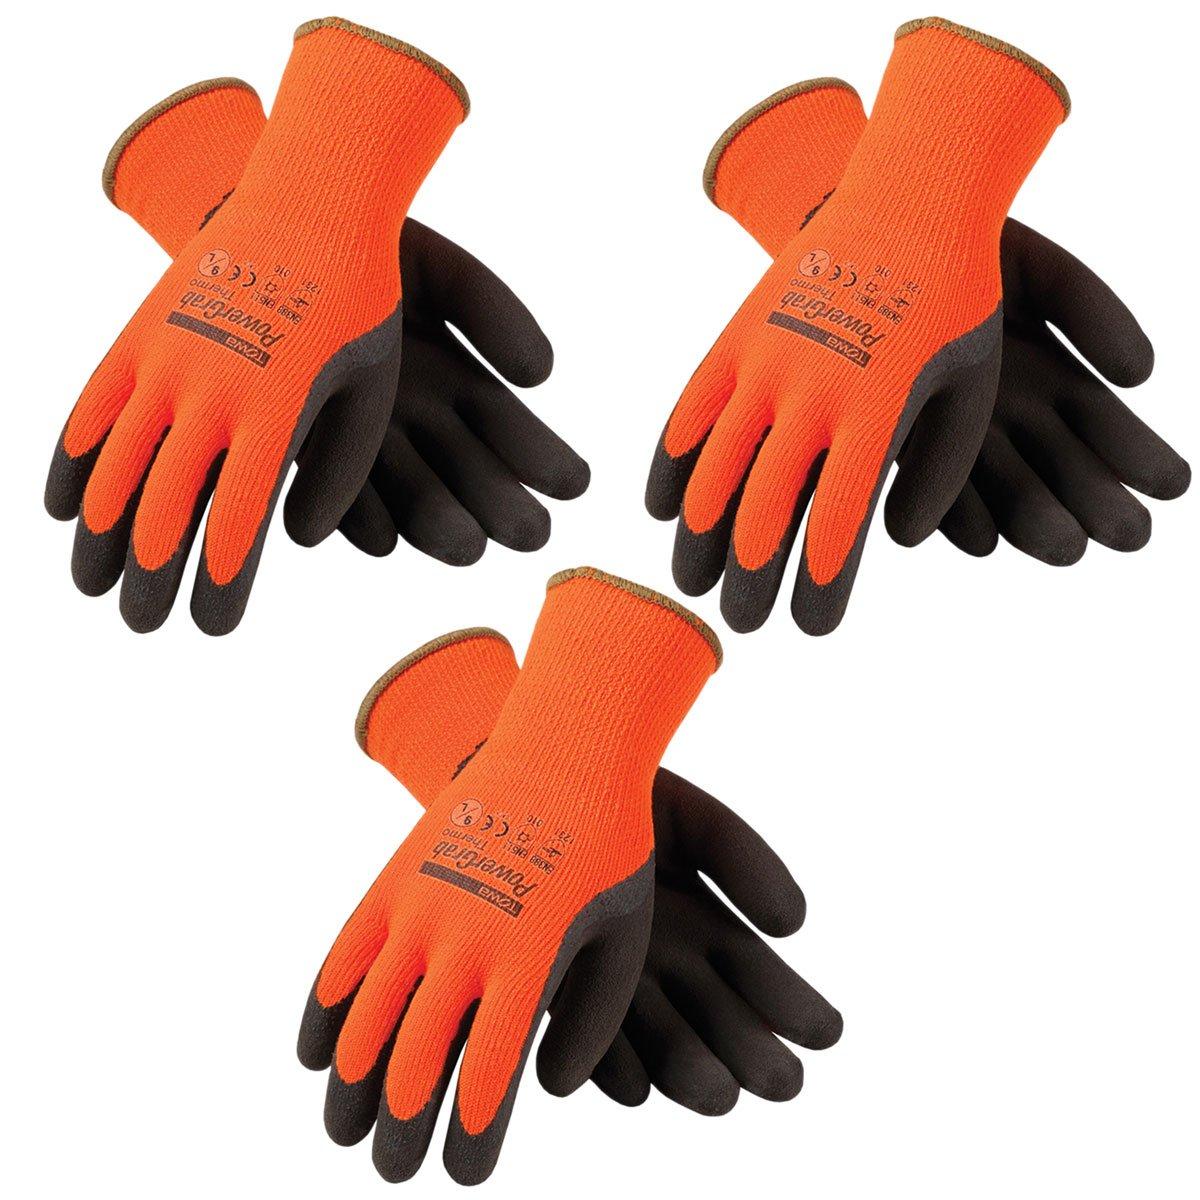 3 Pack Powergrab 41-1400 Thermal Hi-Vis Orange/Black Cold Condition Work Gloves (XX- Large) (3) by Powergrab (Image #1)